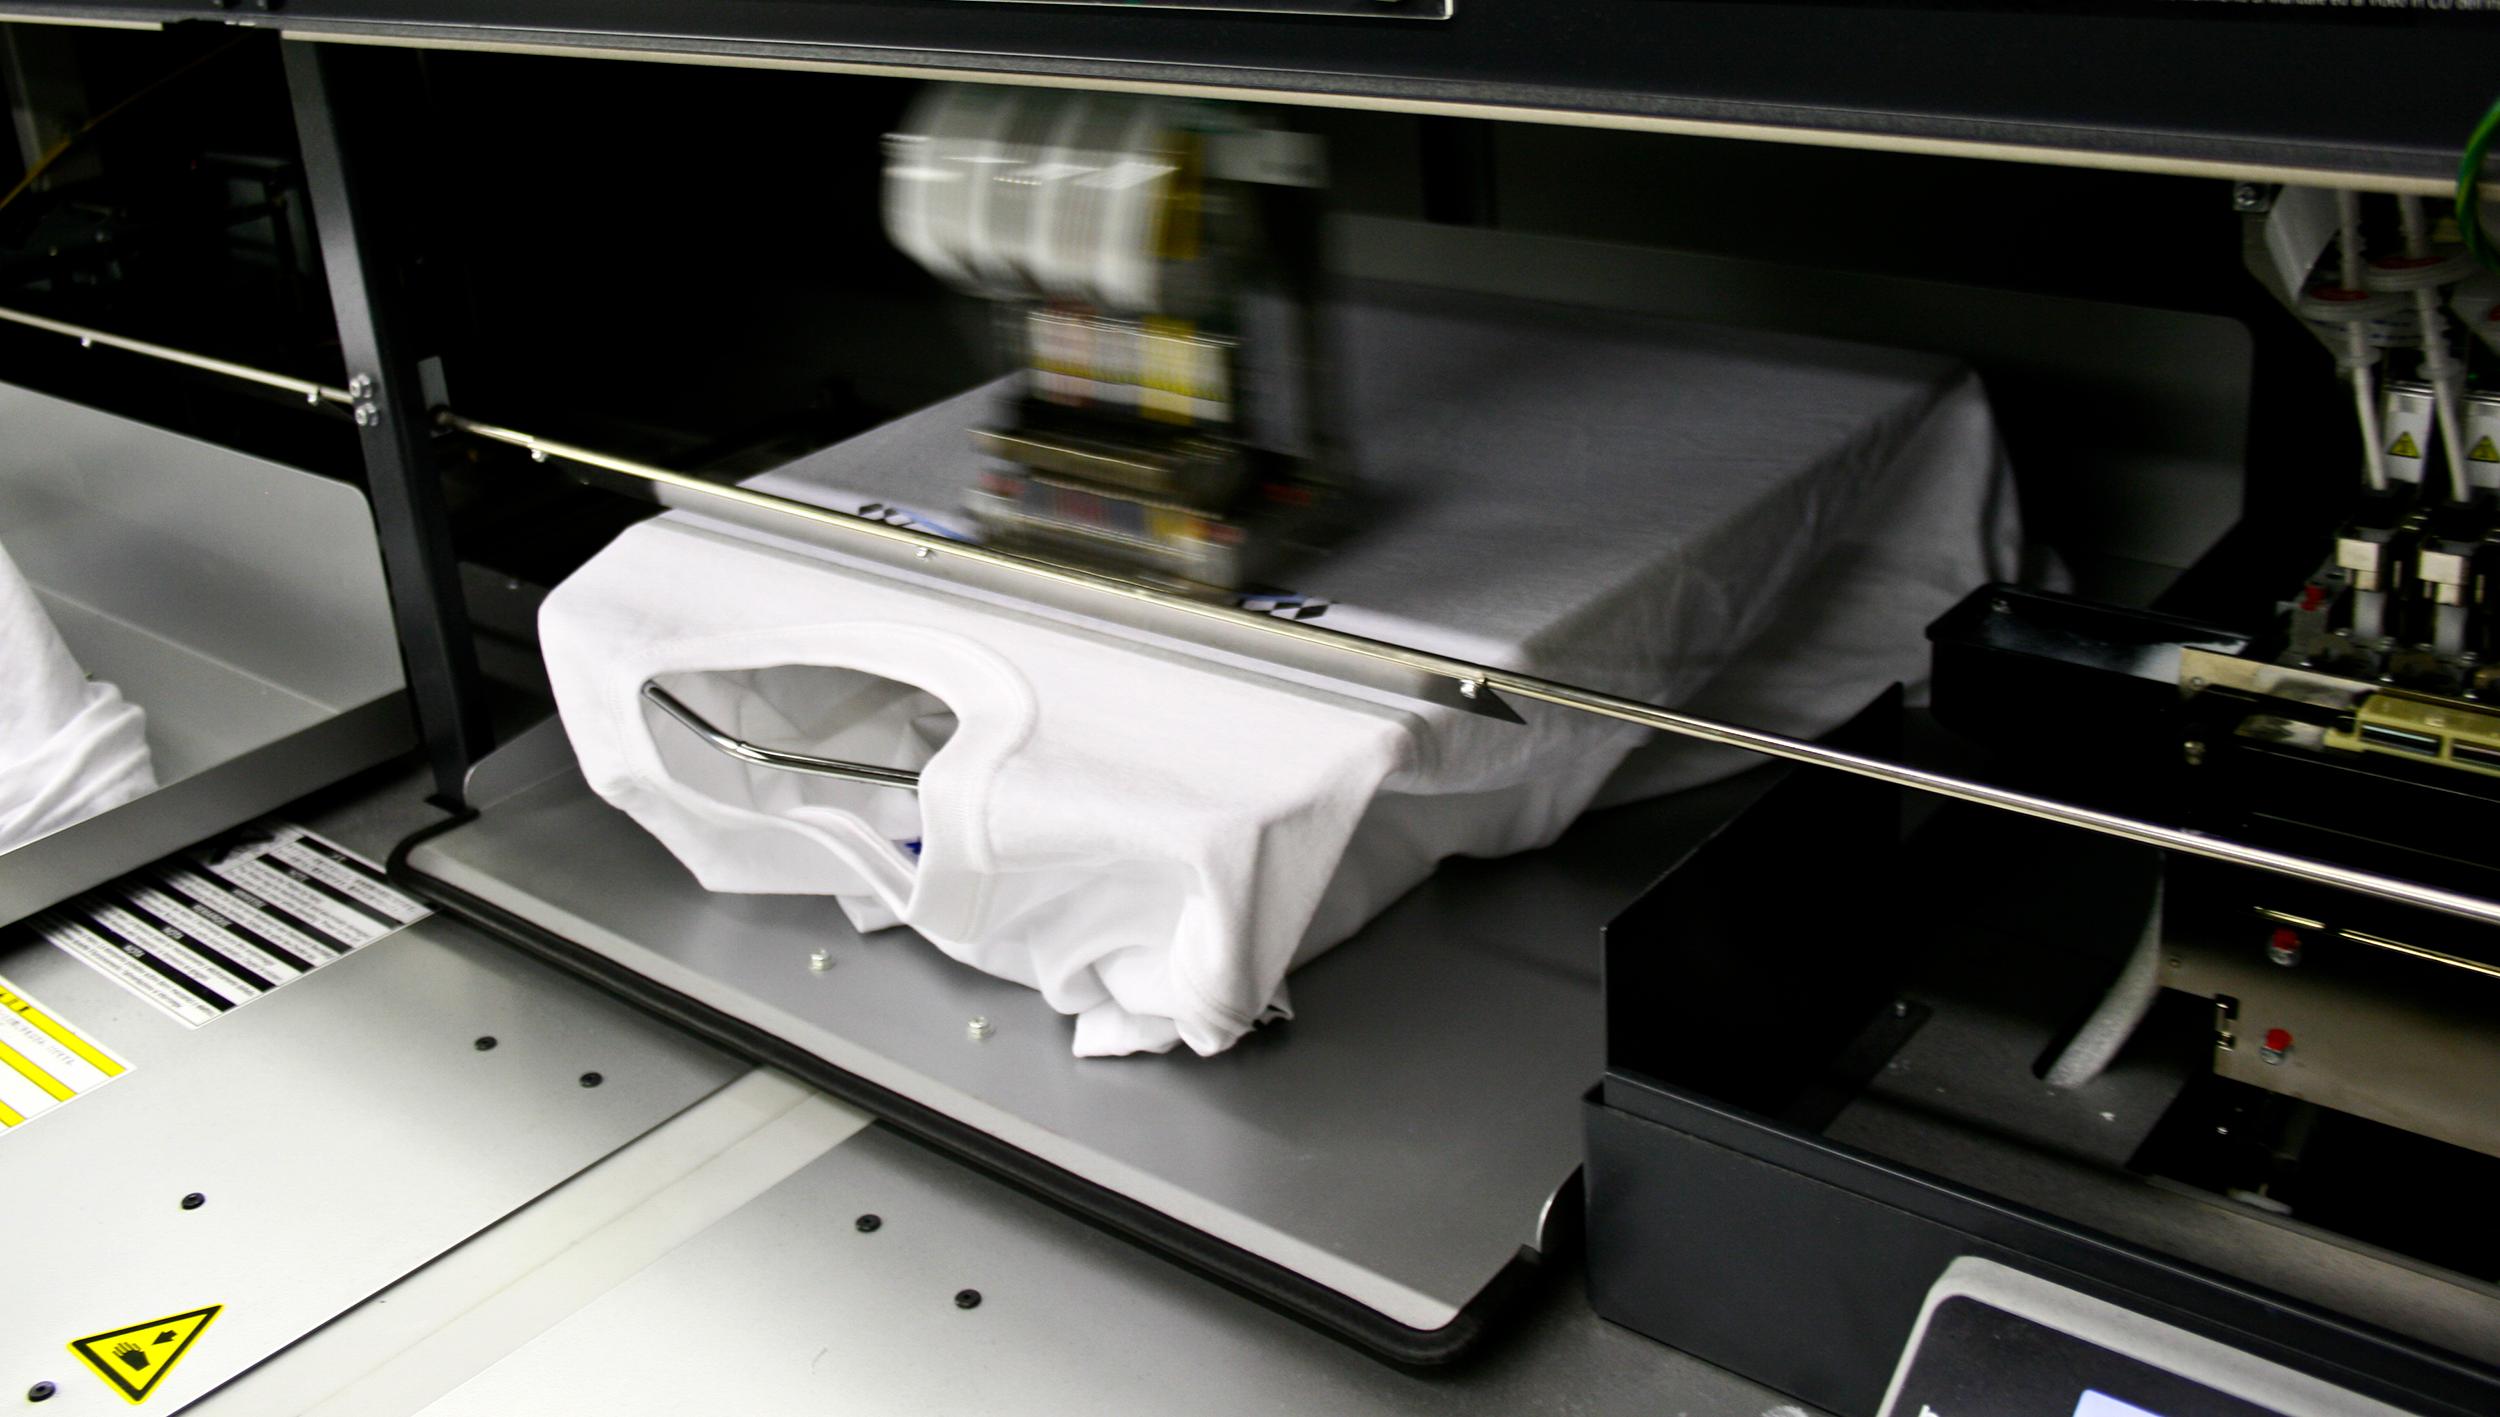 Digital Printing On Fabrics